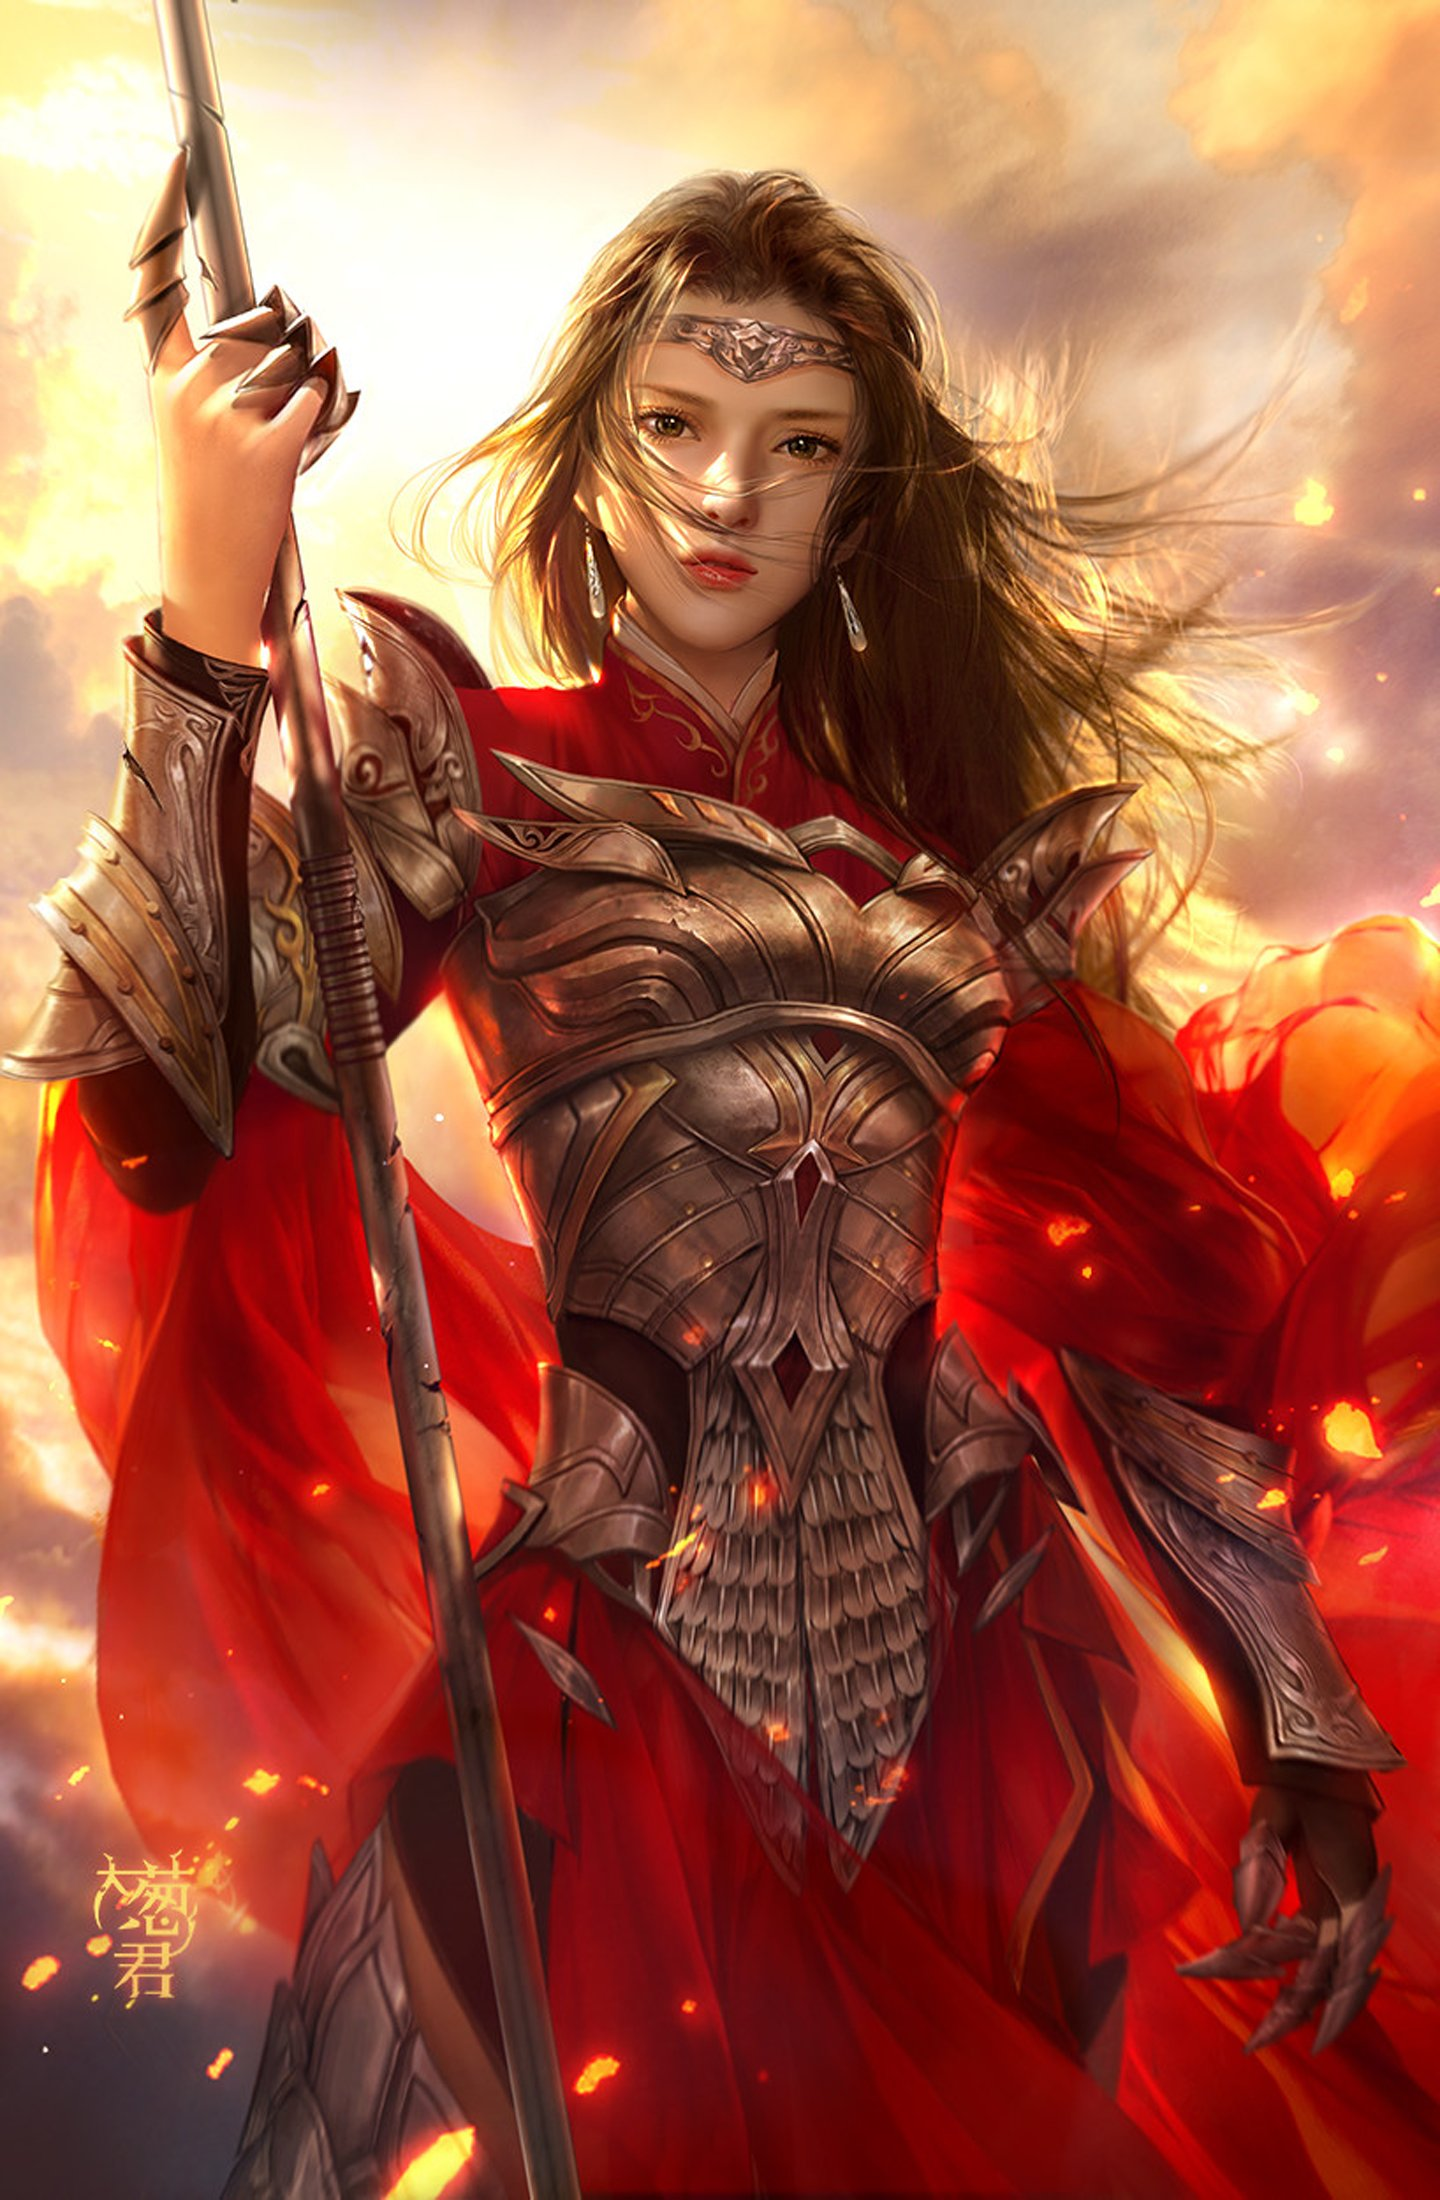 Fantasy Original Girl Woman Character Long Hair Beautiful Red Warrior Wallpaper -9742